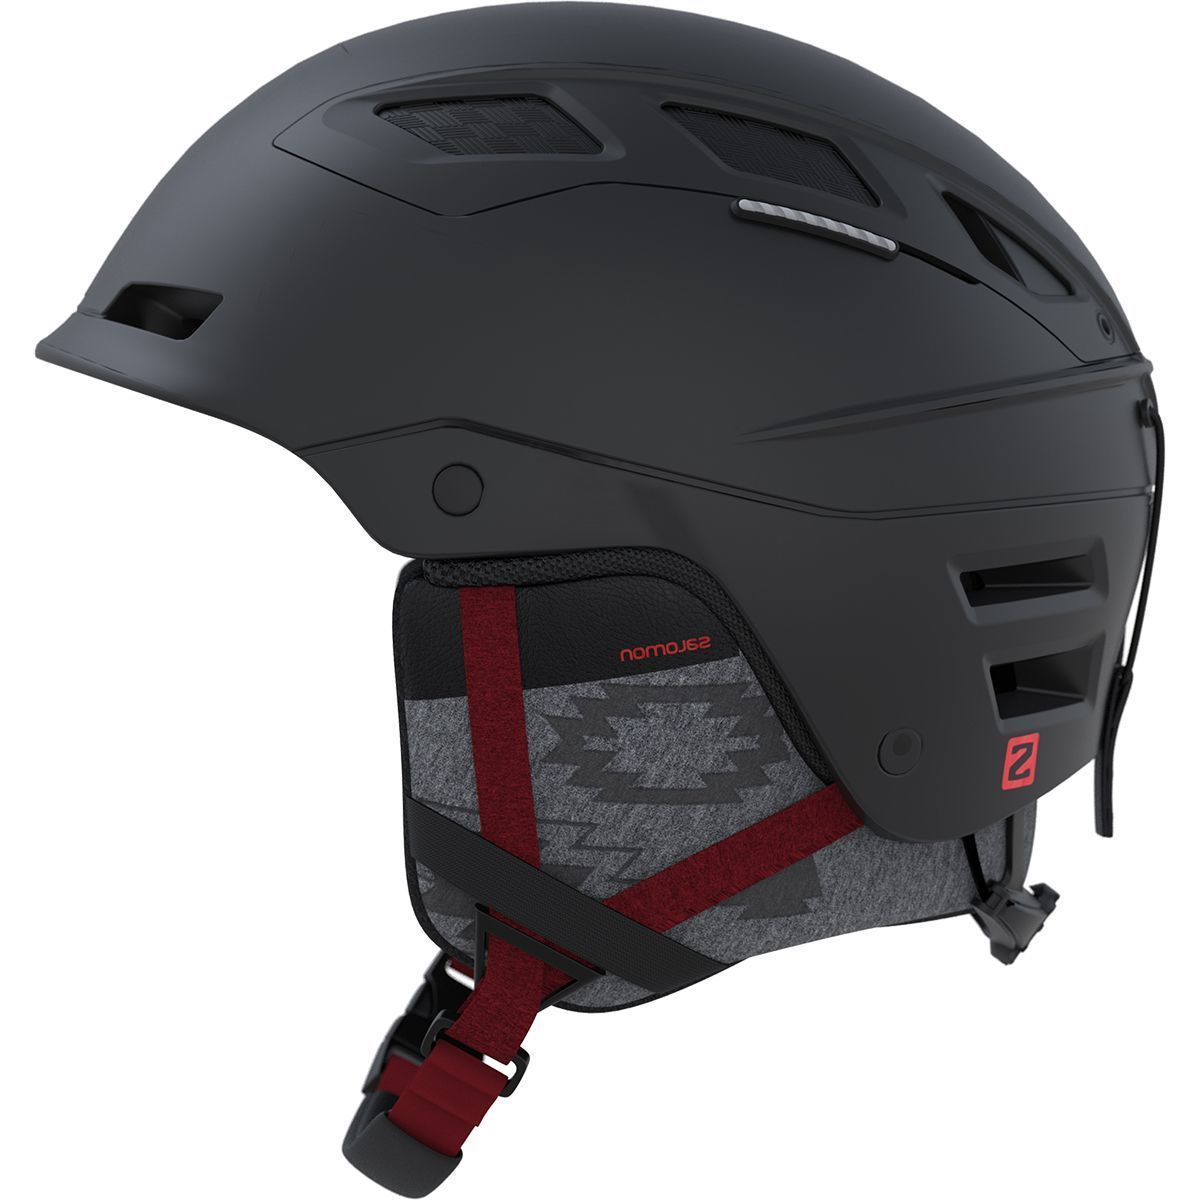 Salomon QST Charge Helmet - Women's